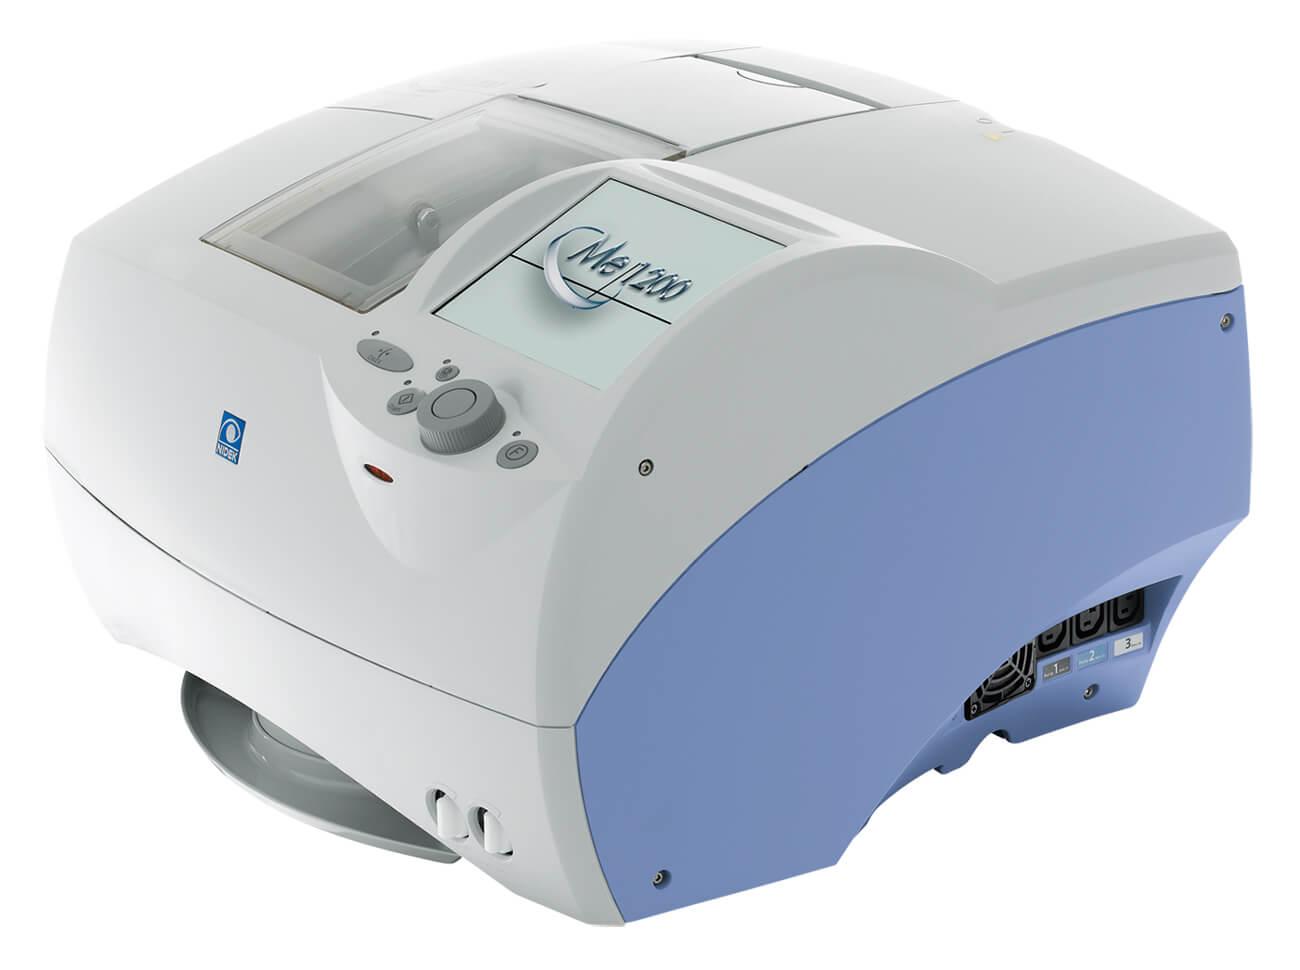 ME-1200